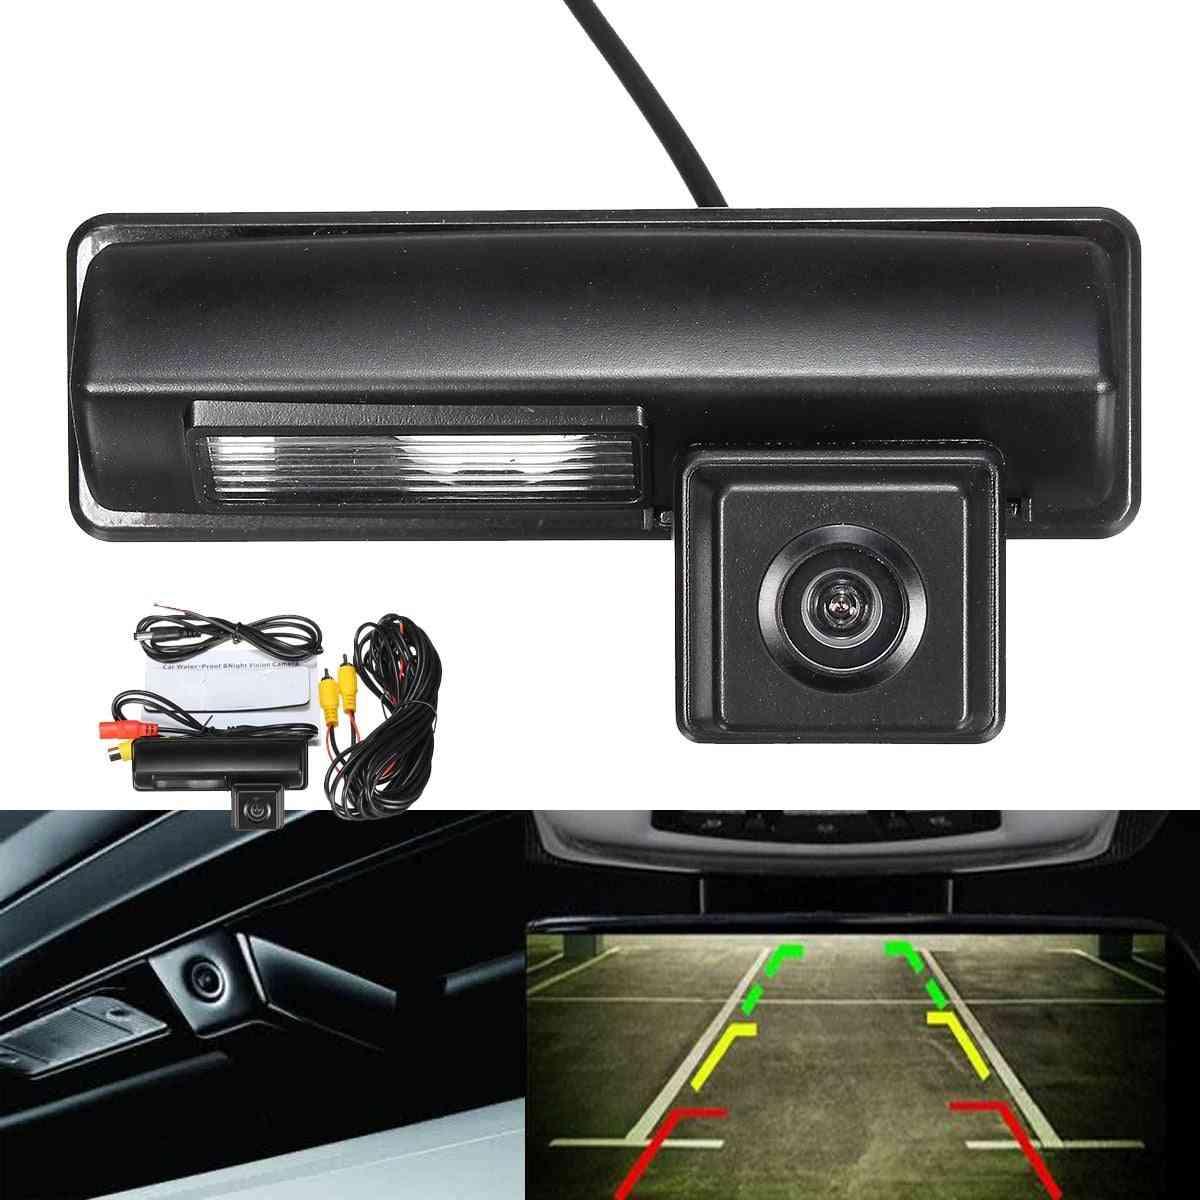 Car Rear View Camera, Camry Reverse Backup Cameras Parking Aid